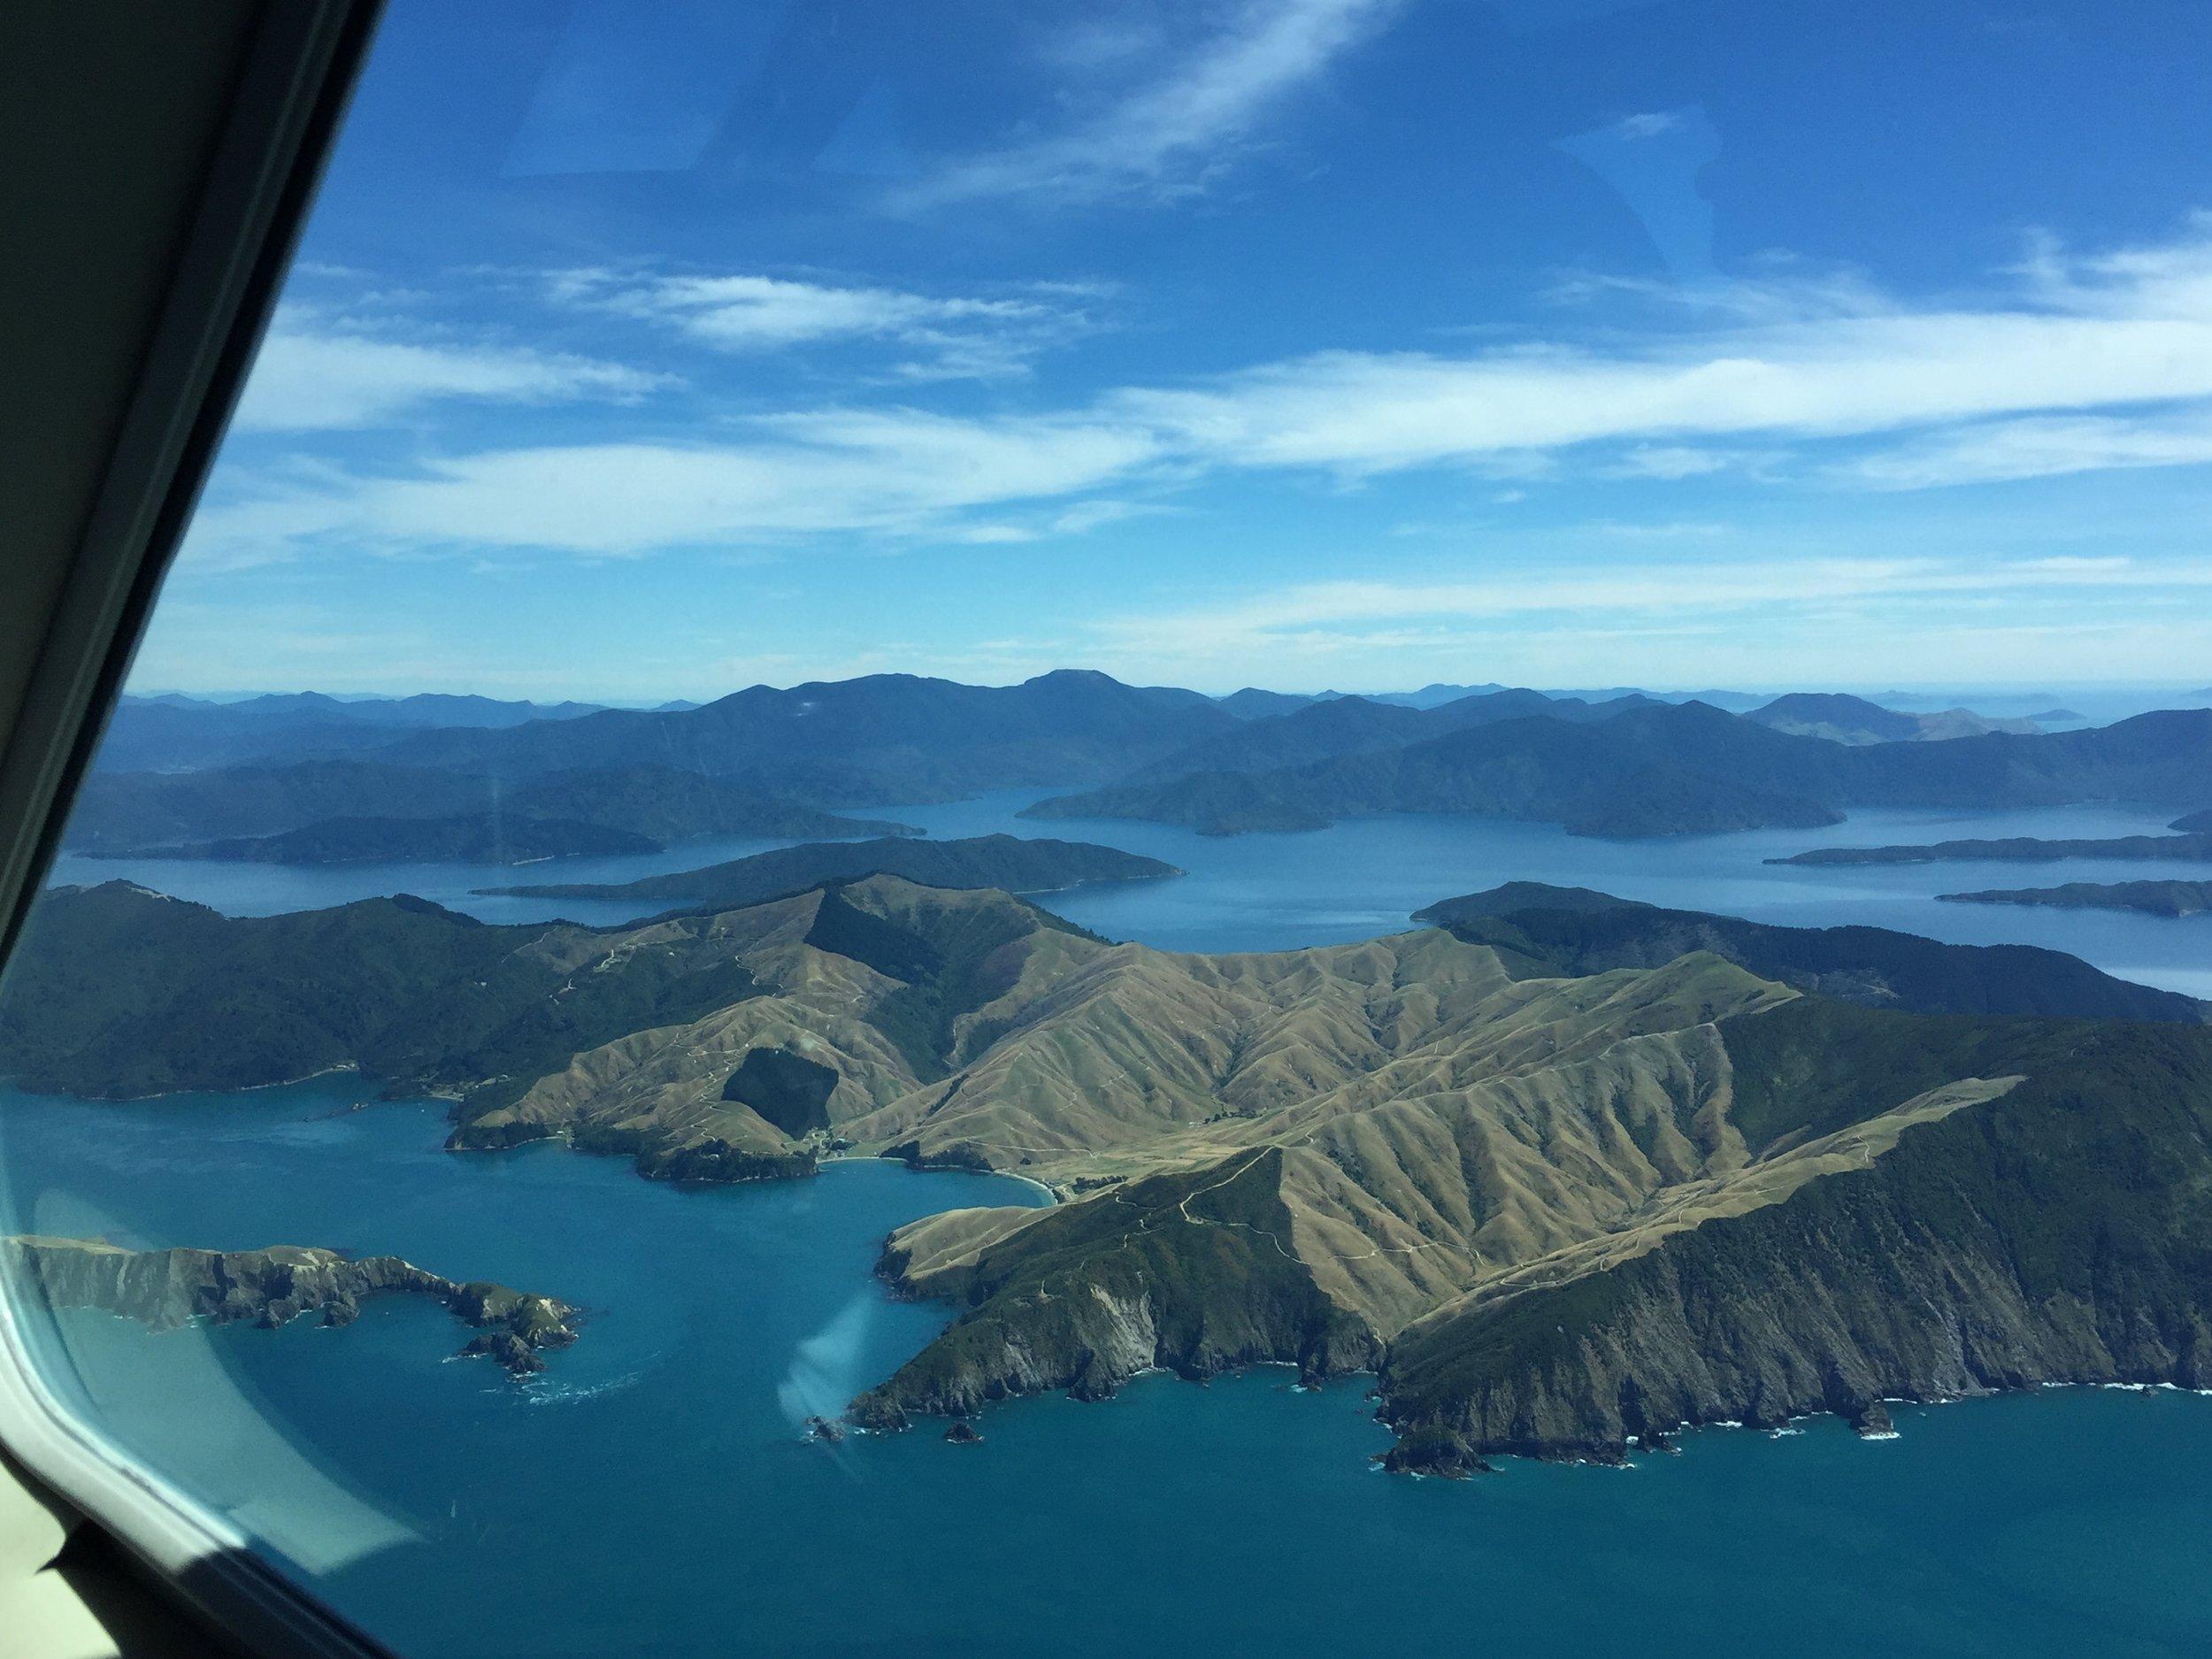 New Zealand, Keran's homeland